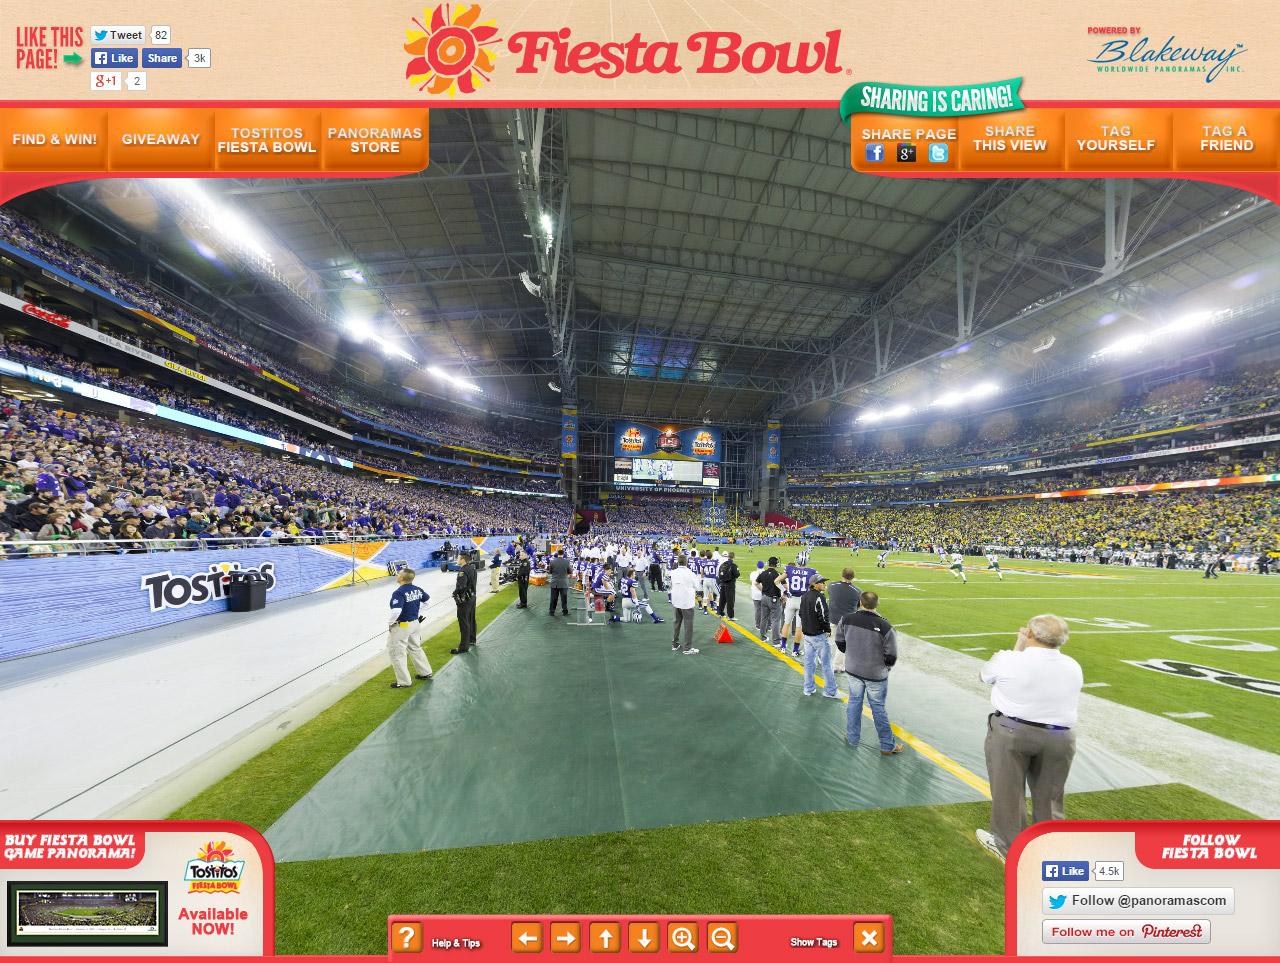 2013 Fiesta Bowl